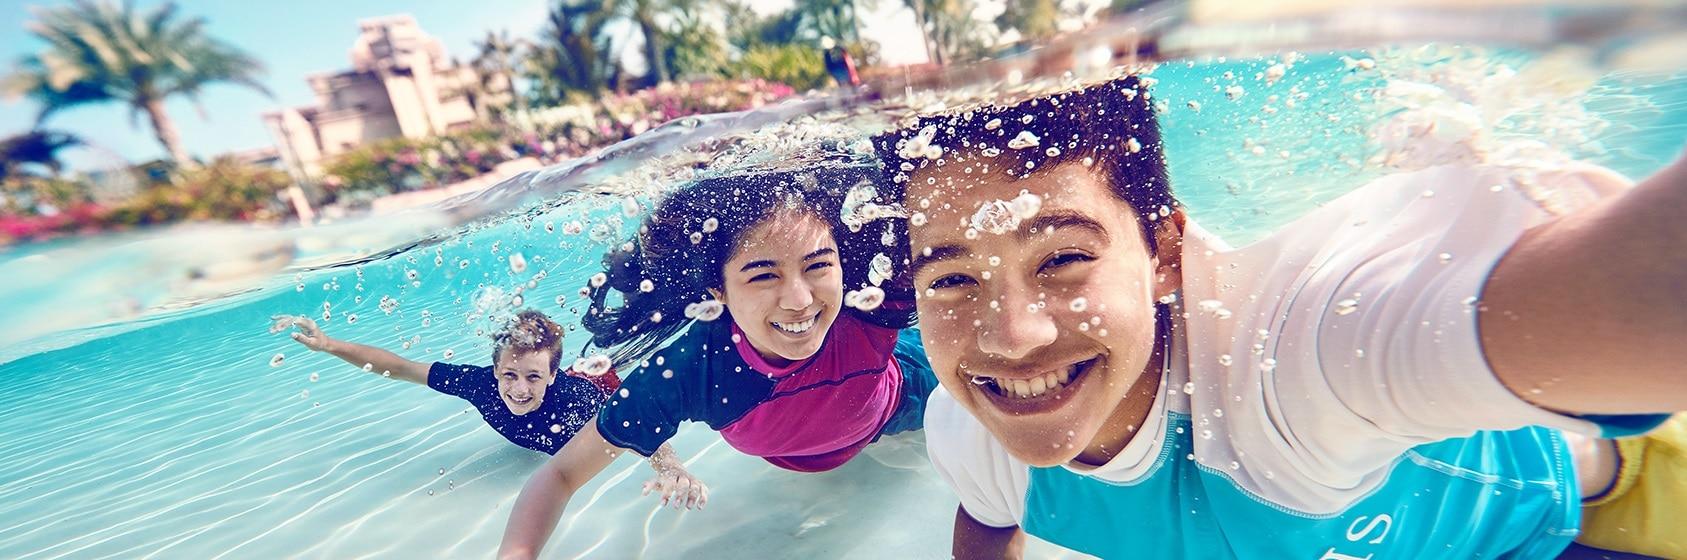 familieoplevelser-i-Dubai - Aquaventure-Hero-3x1.jpg